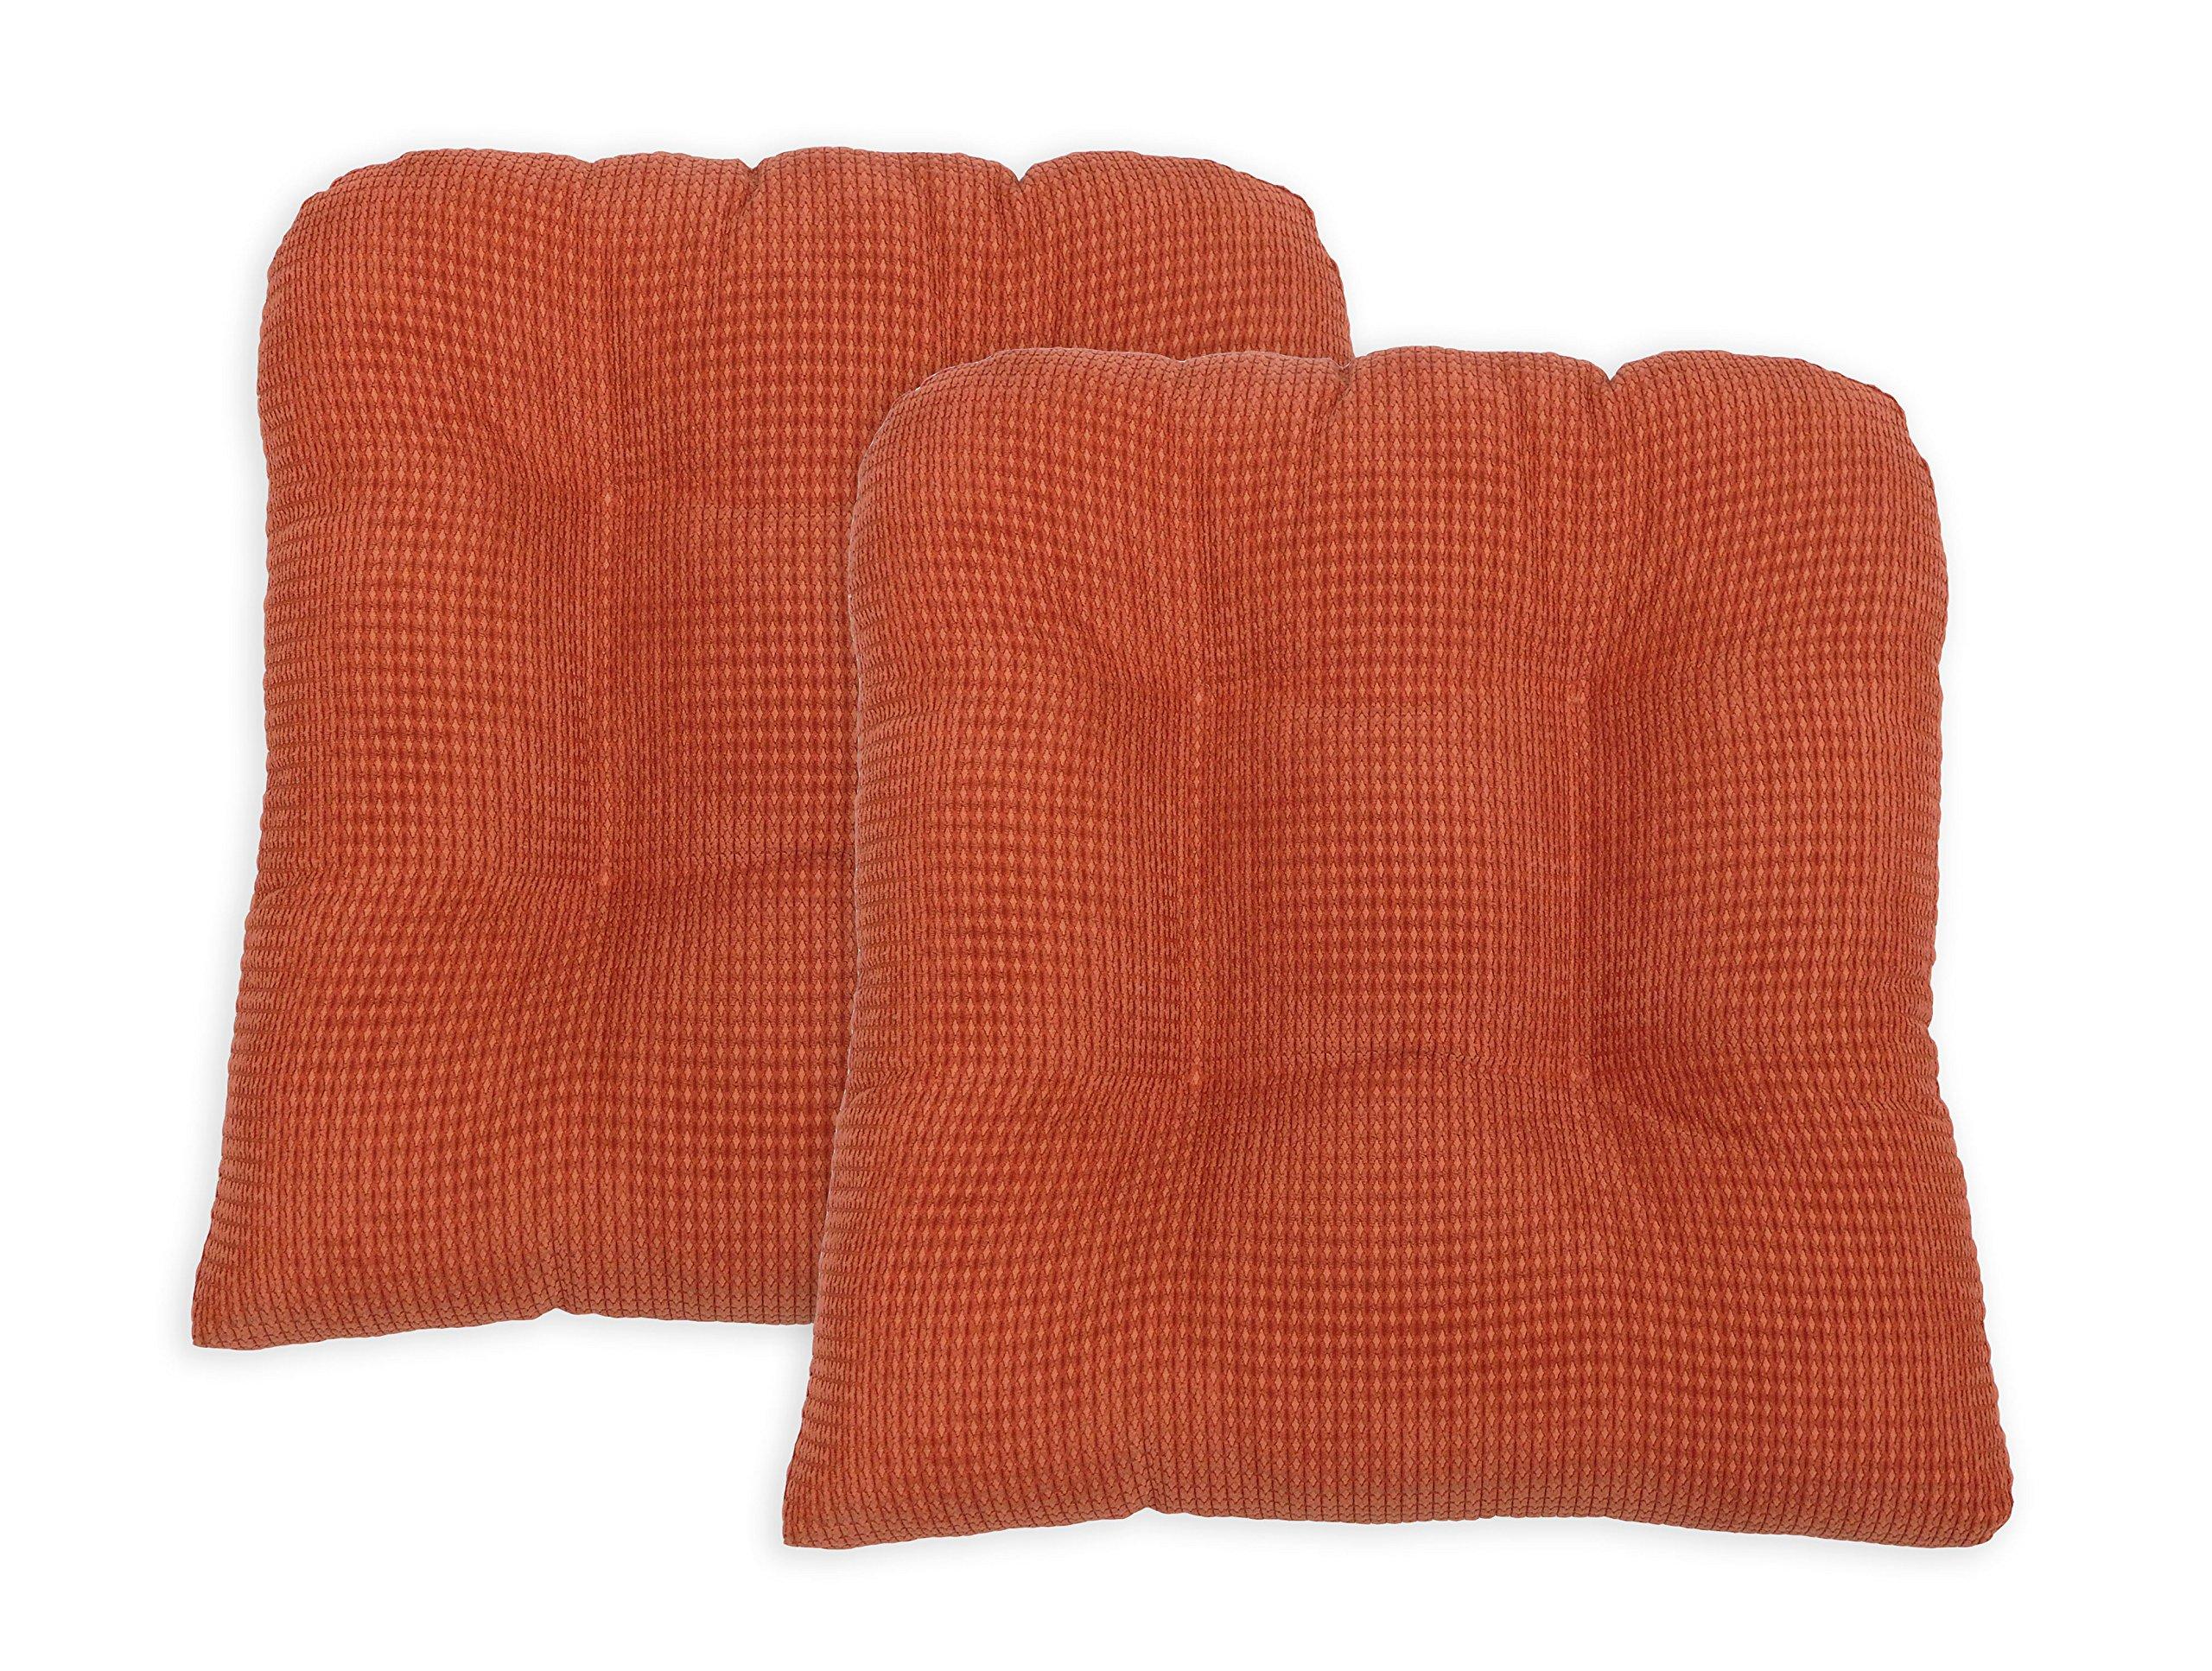 Arlee Memory Foam, Non-Skid Chair Pad Seat Cushion, Set of Two (2), Autumn Glaze Orange, 2 Piece